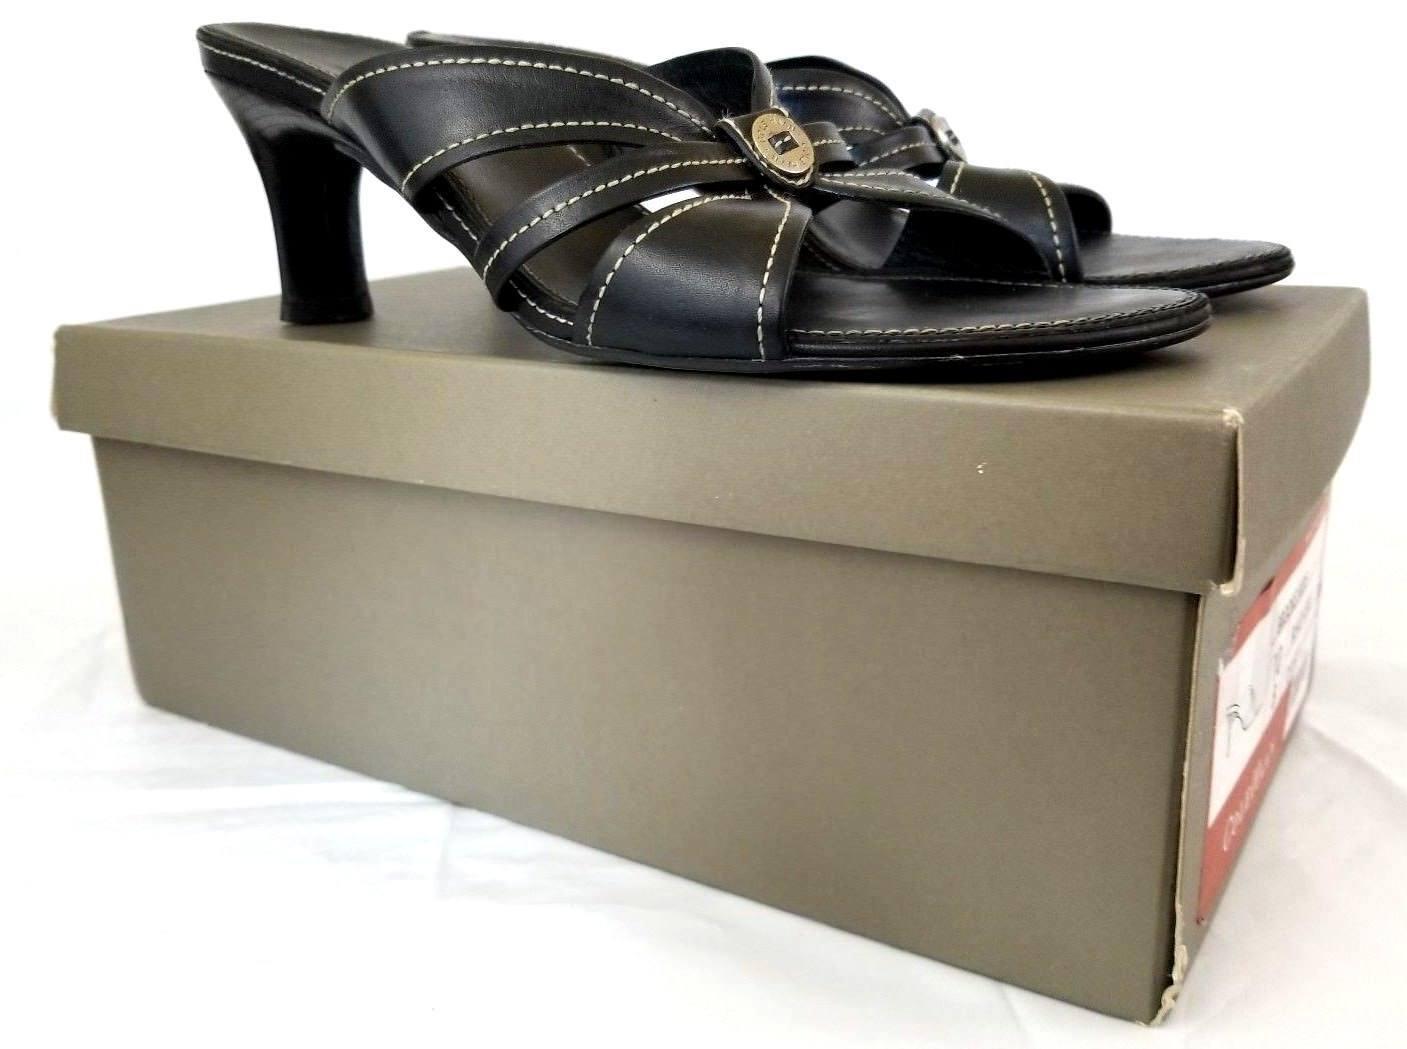 Cole Haan Women's Brooke Slide Sandals Black Calf D16921 US 10 UK 8 EU 42 Z546